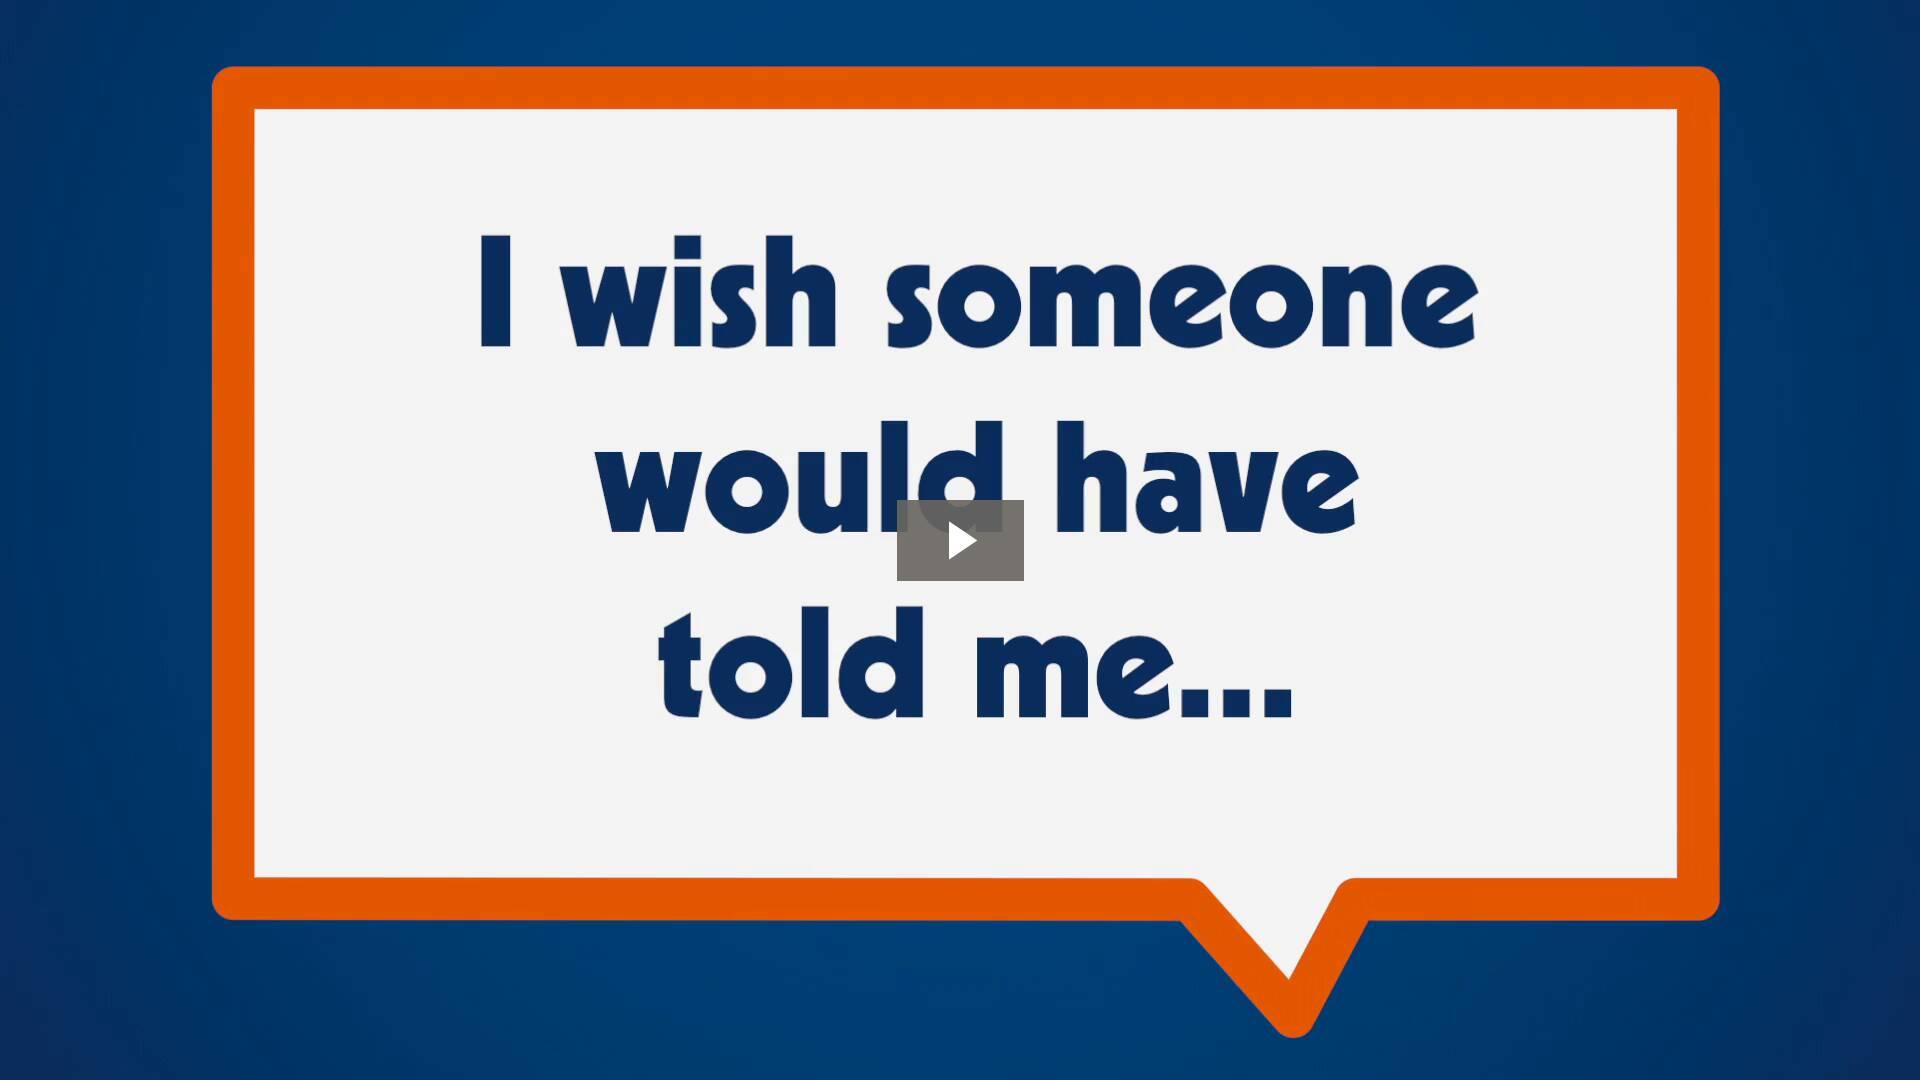 Thumbnail for the 'Supplemental Retirement Plans' video.